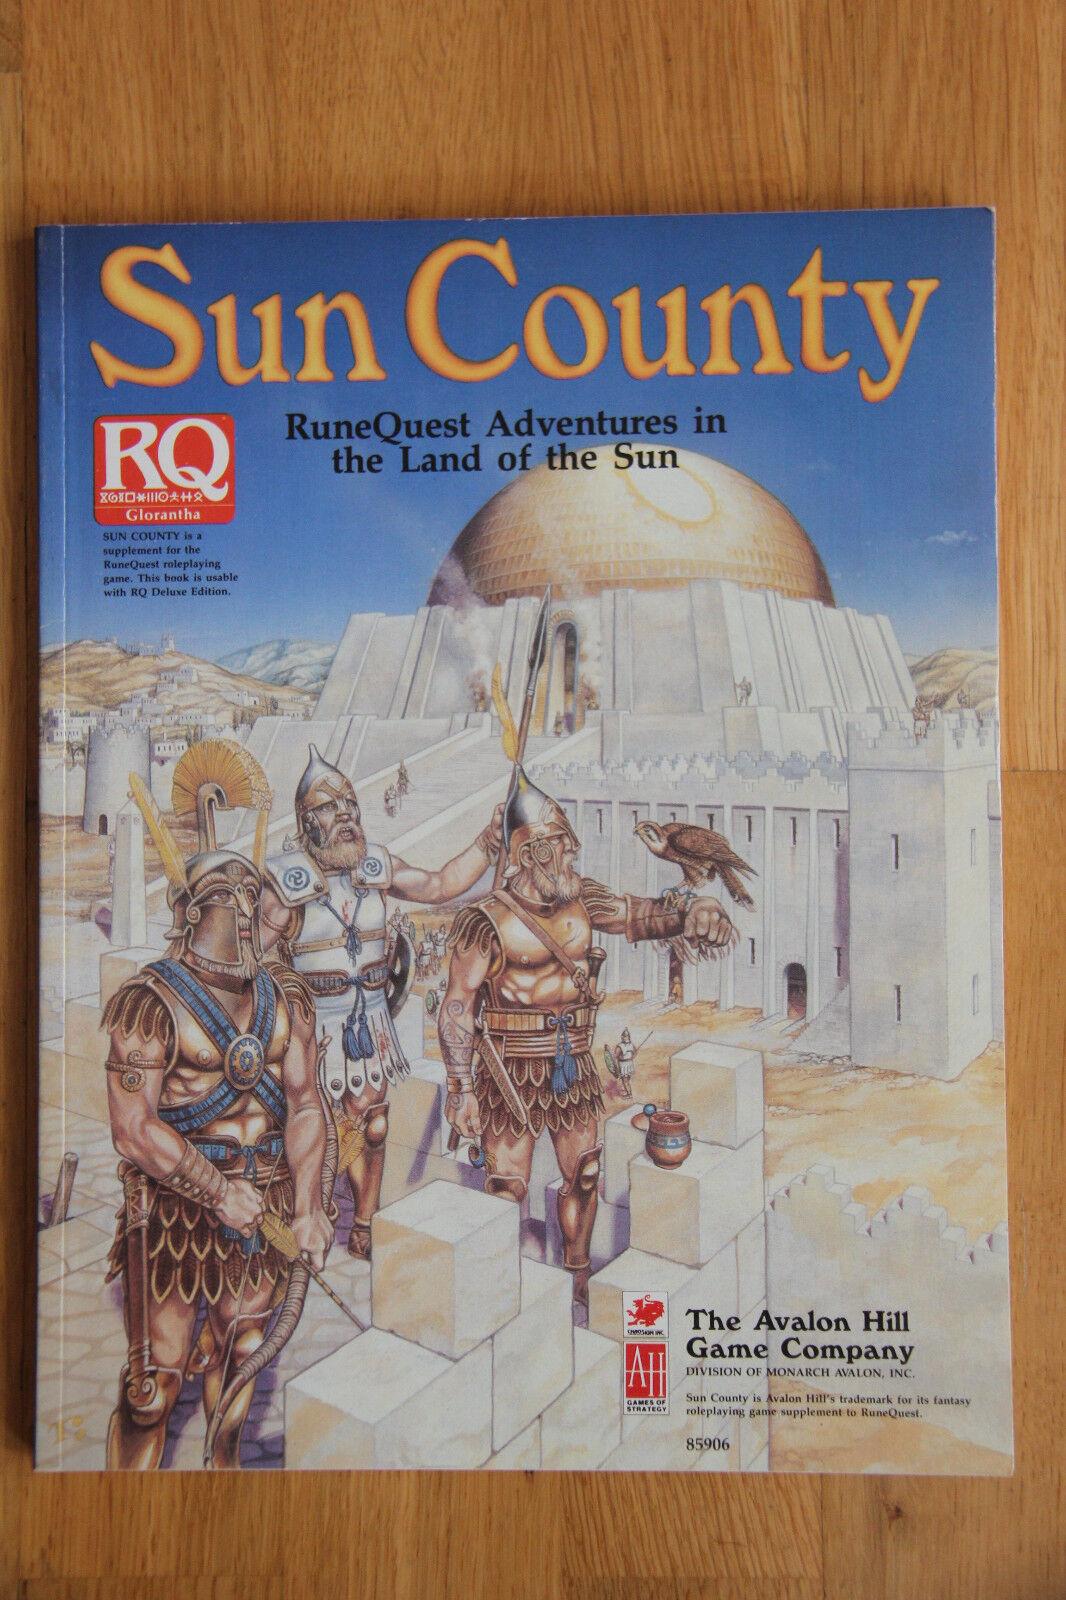 Avalon Hill - RuneQuest 3rd ed. - Sun County (1992)